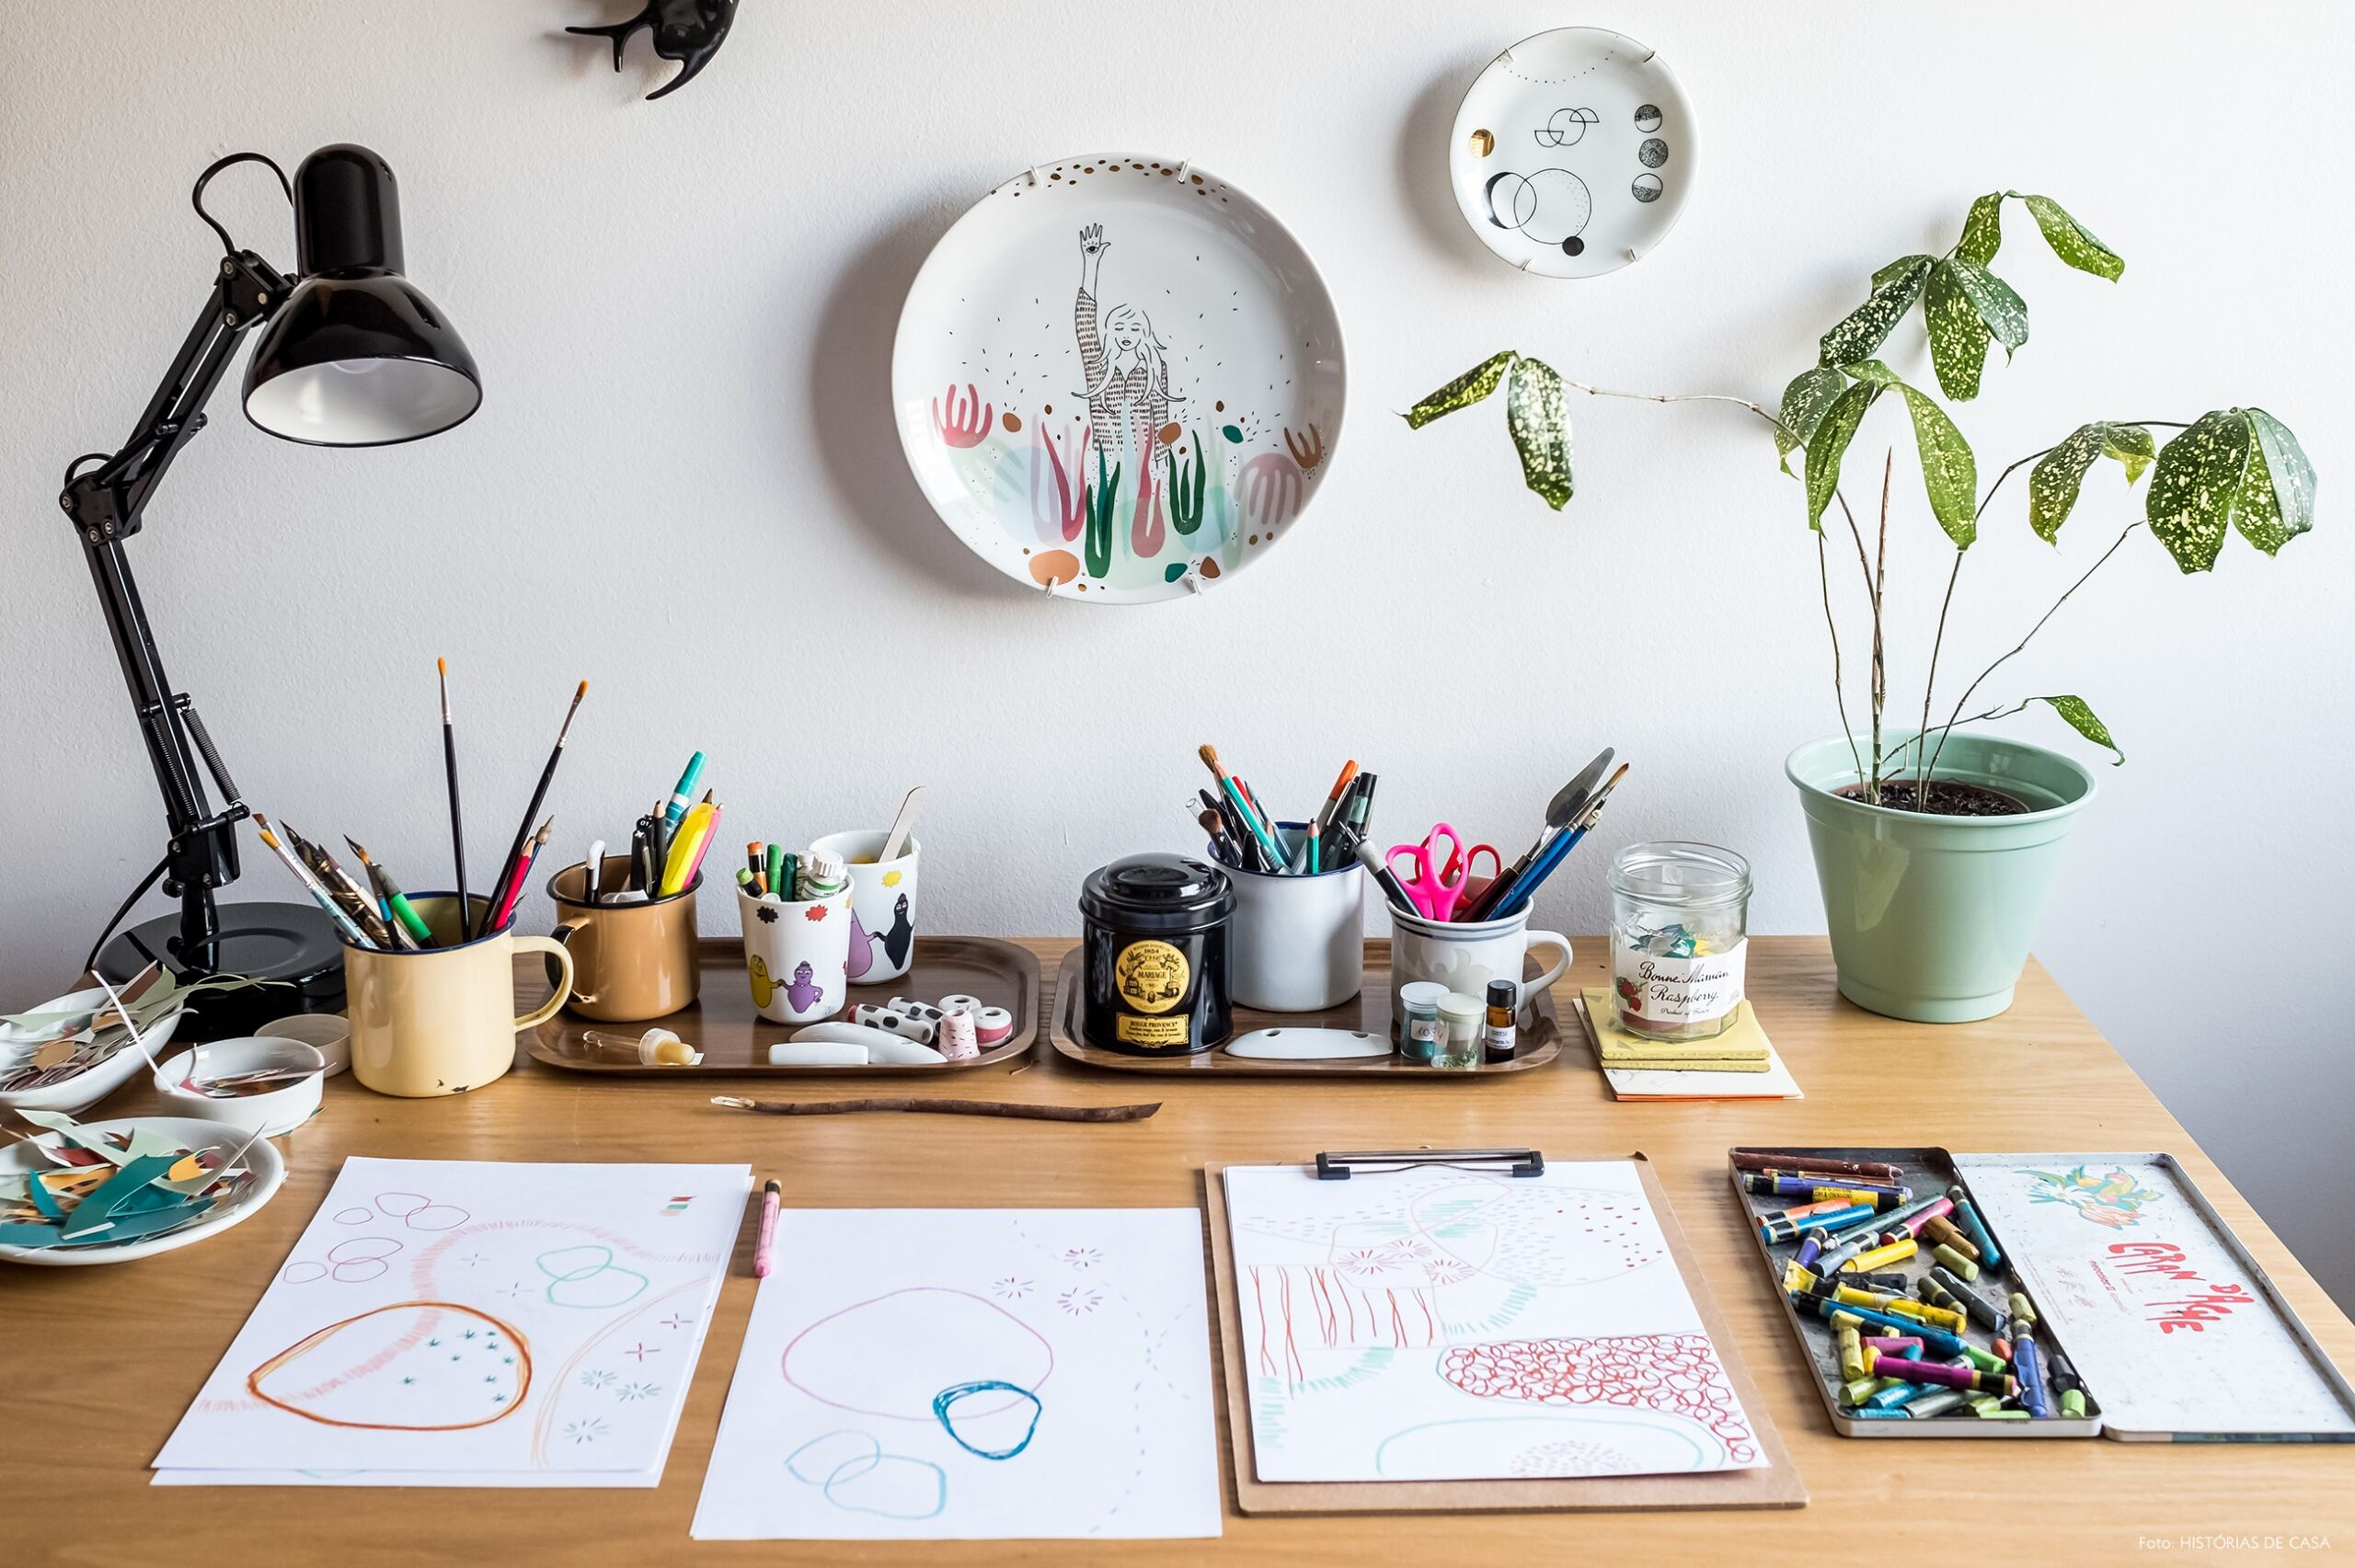 Home office da ilustradora Cynthia Gyuru